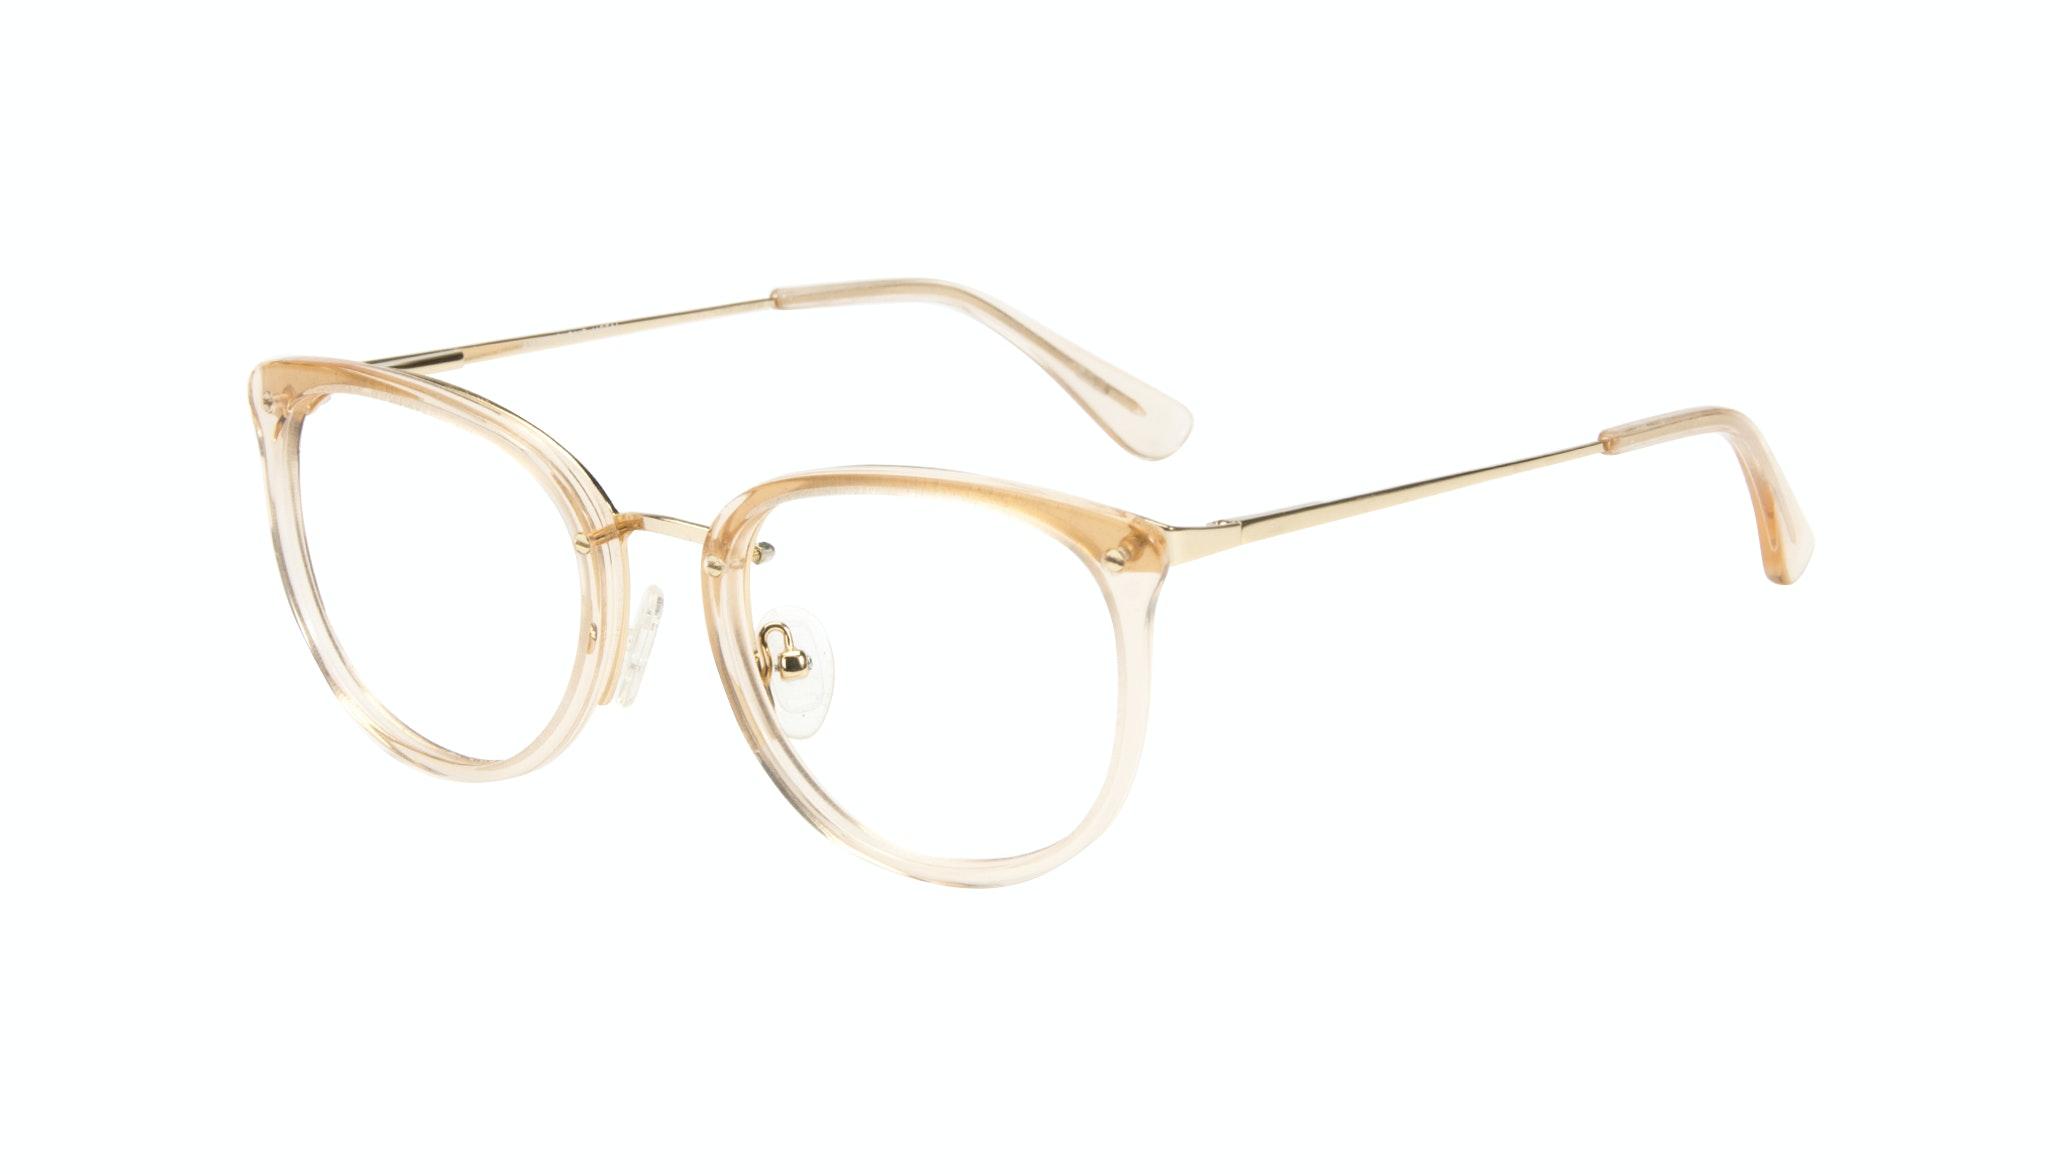 Affordable Fashion Glasses Square Round Eyeglasses Women Amaze Blond Metal Tilt